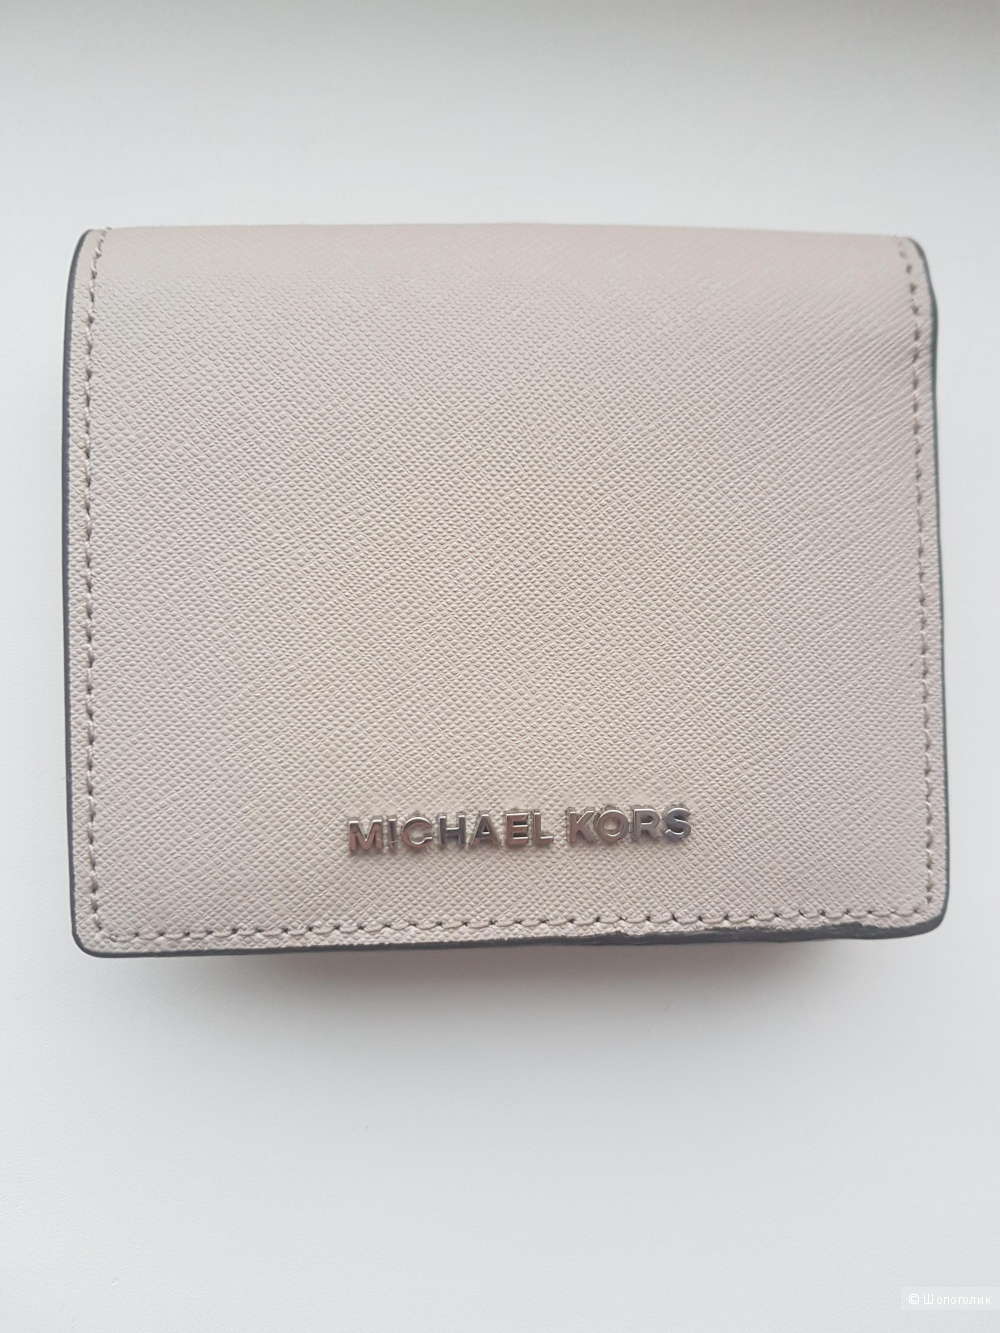 Michael Kors кошелек